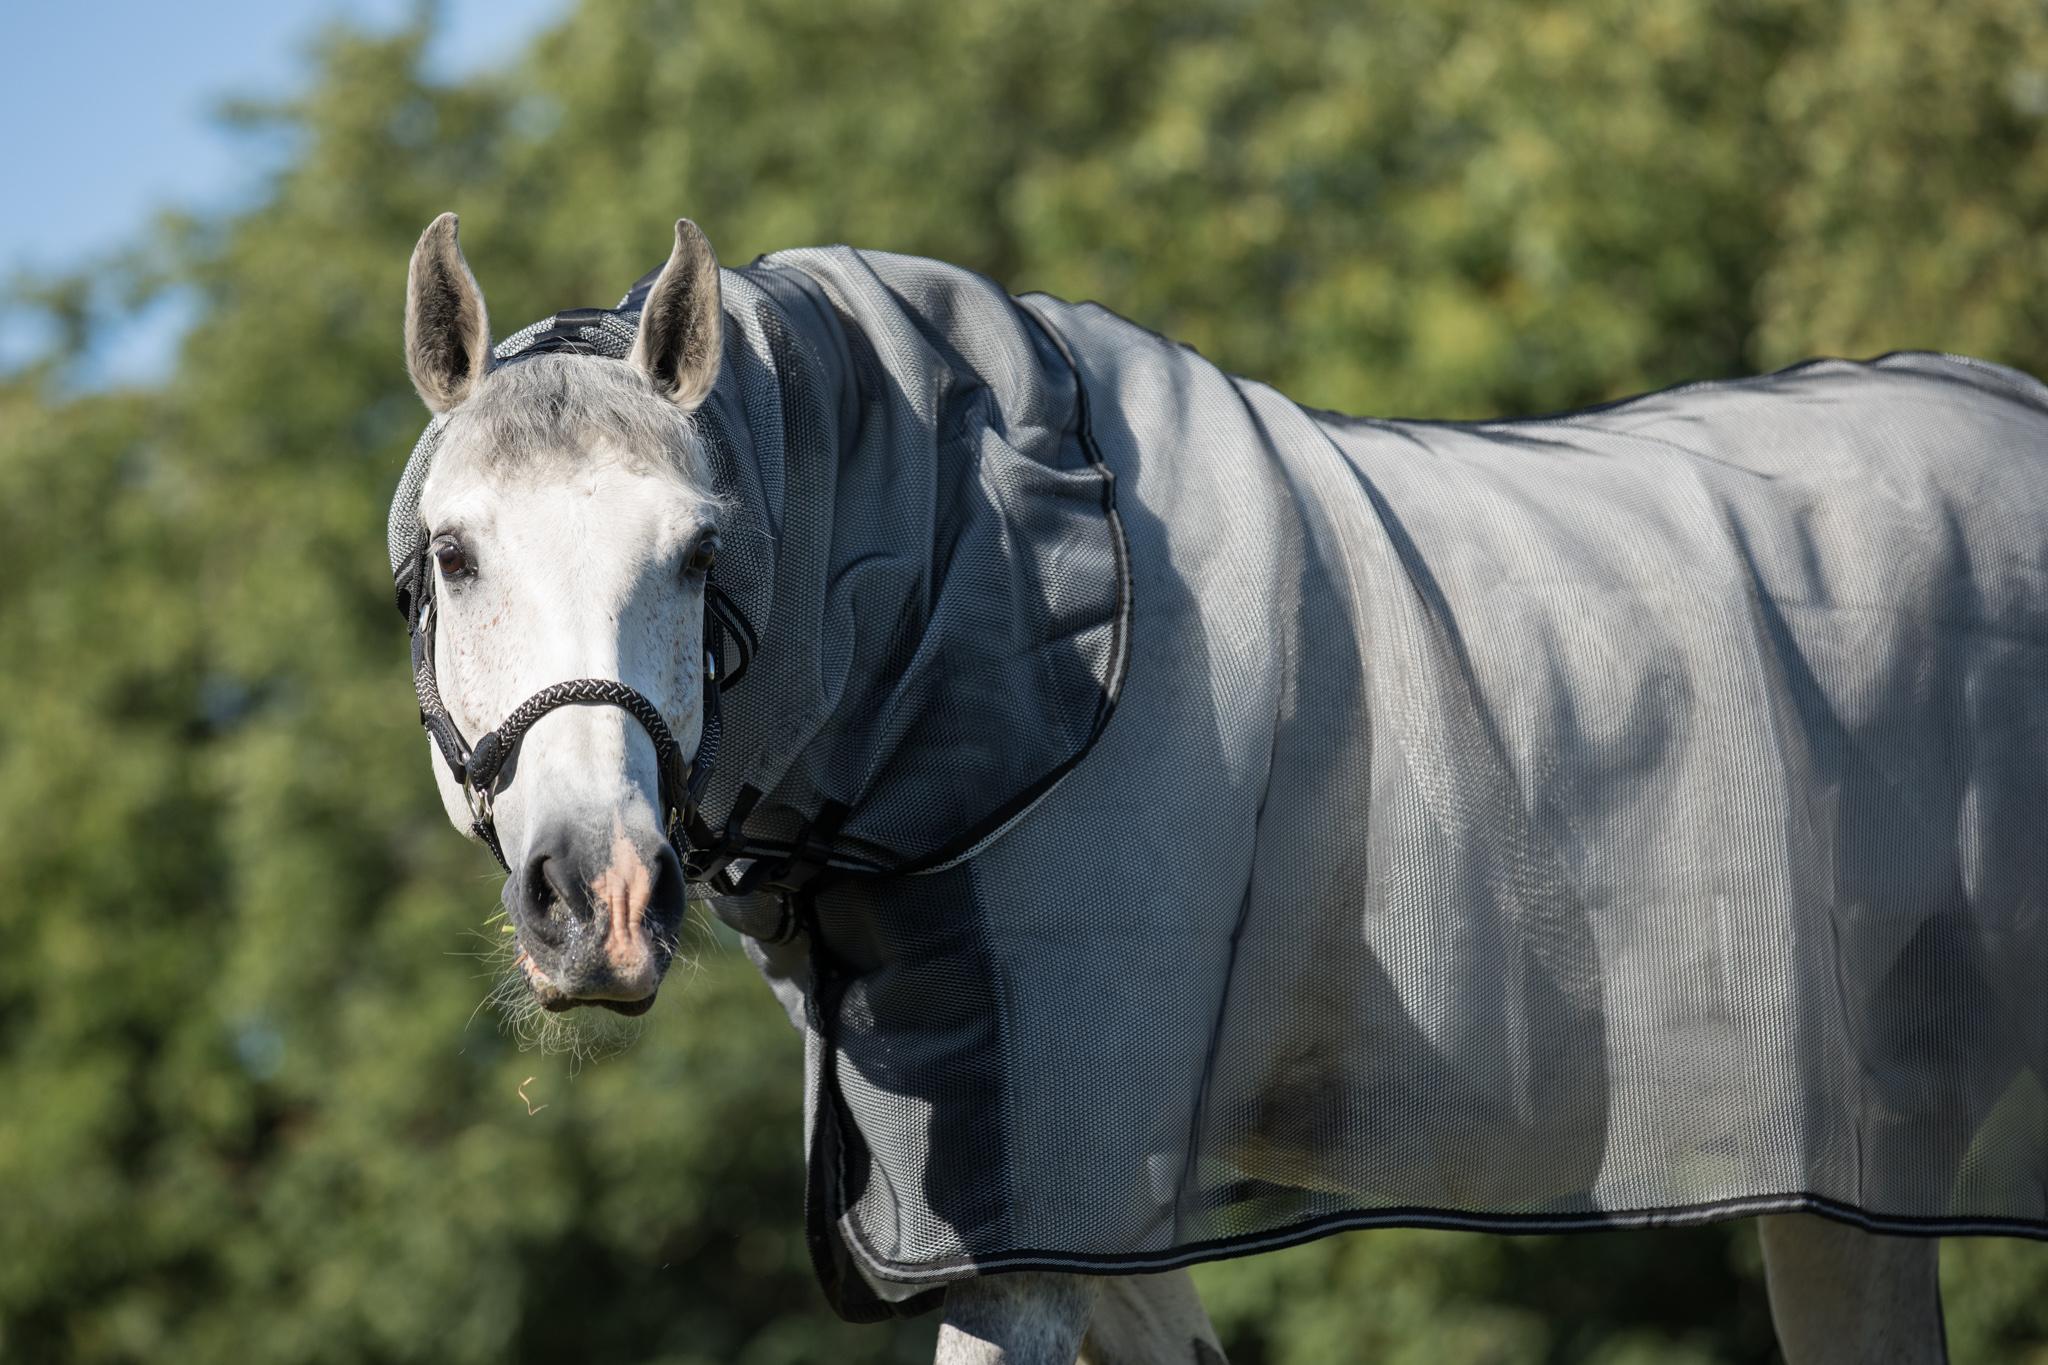 equine-microtec-marvin-vroomen-200601-FS193992